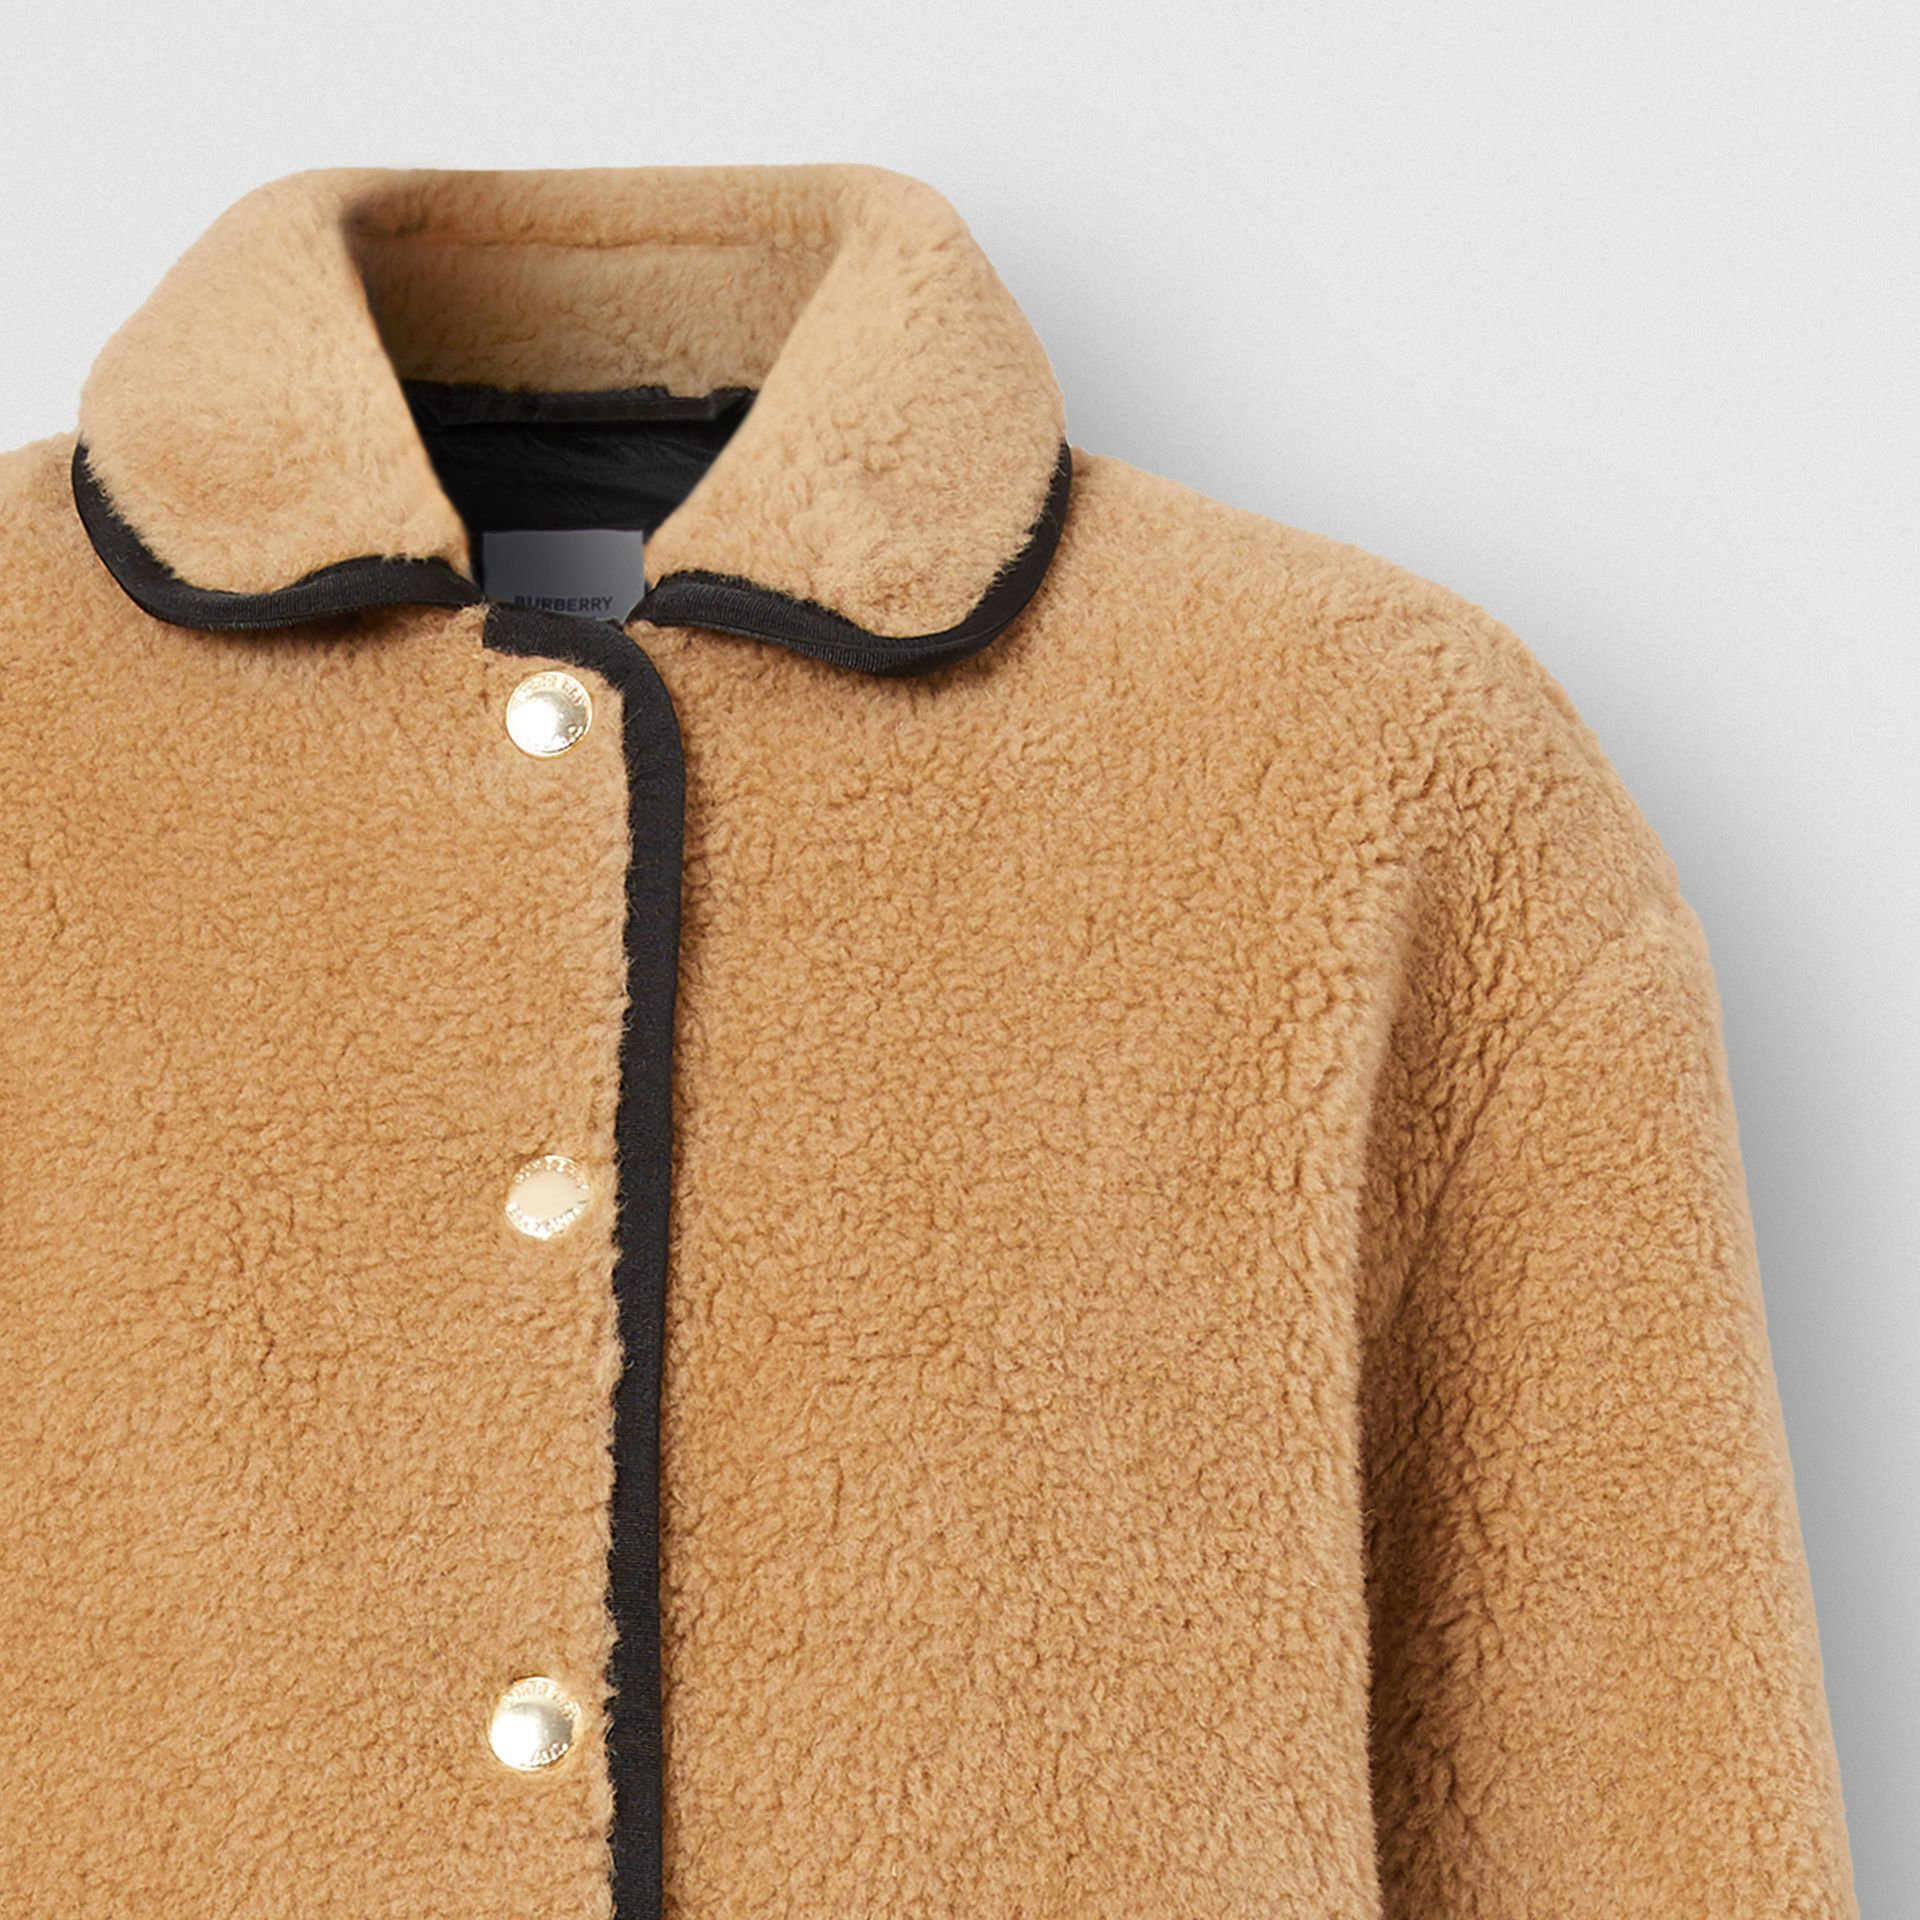 Stripe Intarsia Fleece Jacket in Light Camel - Women | Burberry - gallery image 6